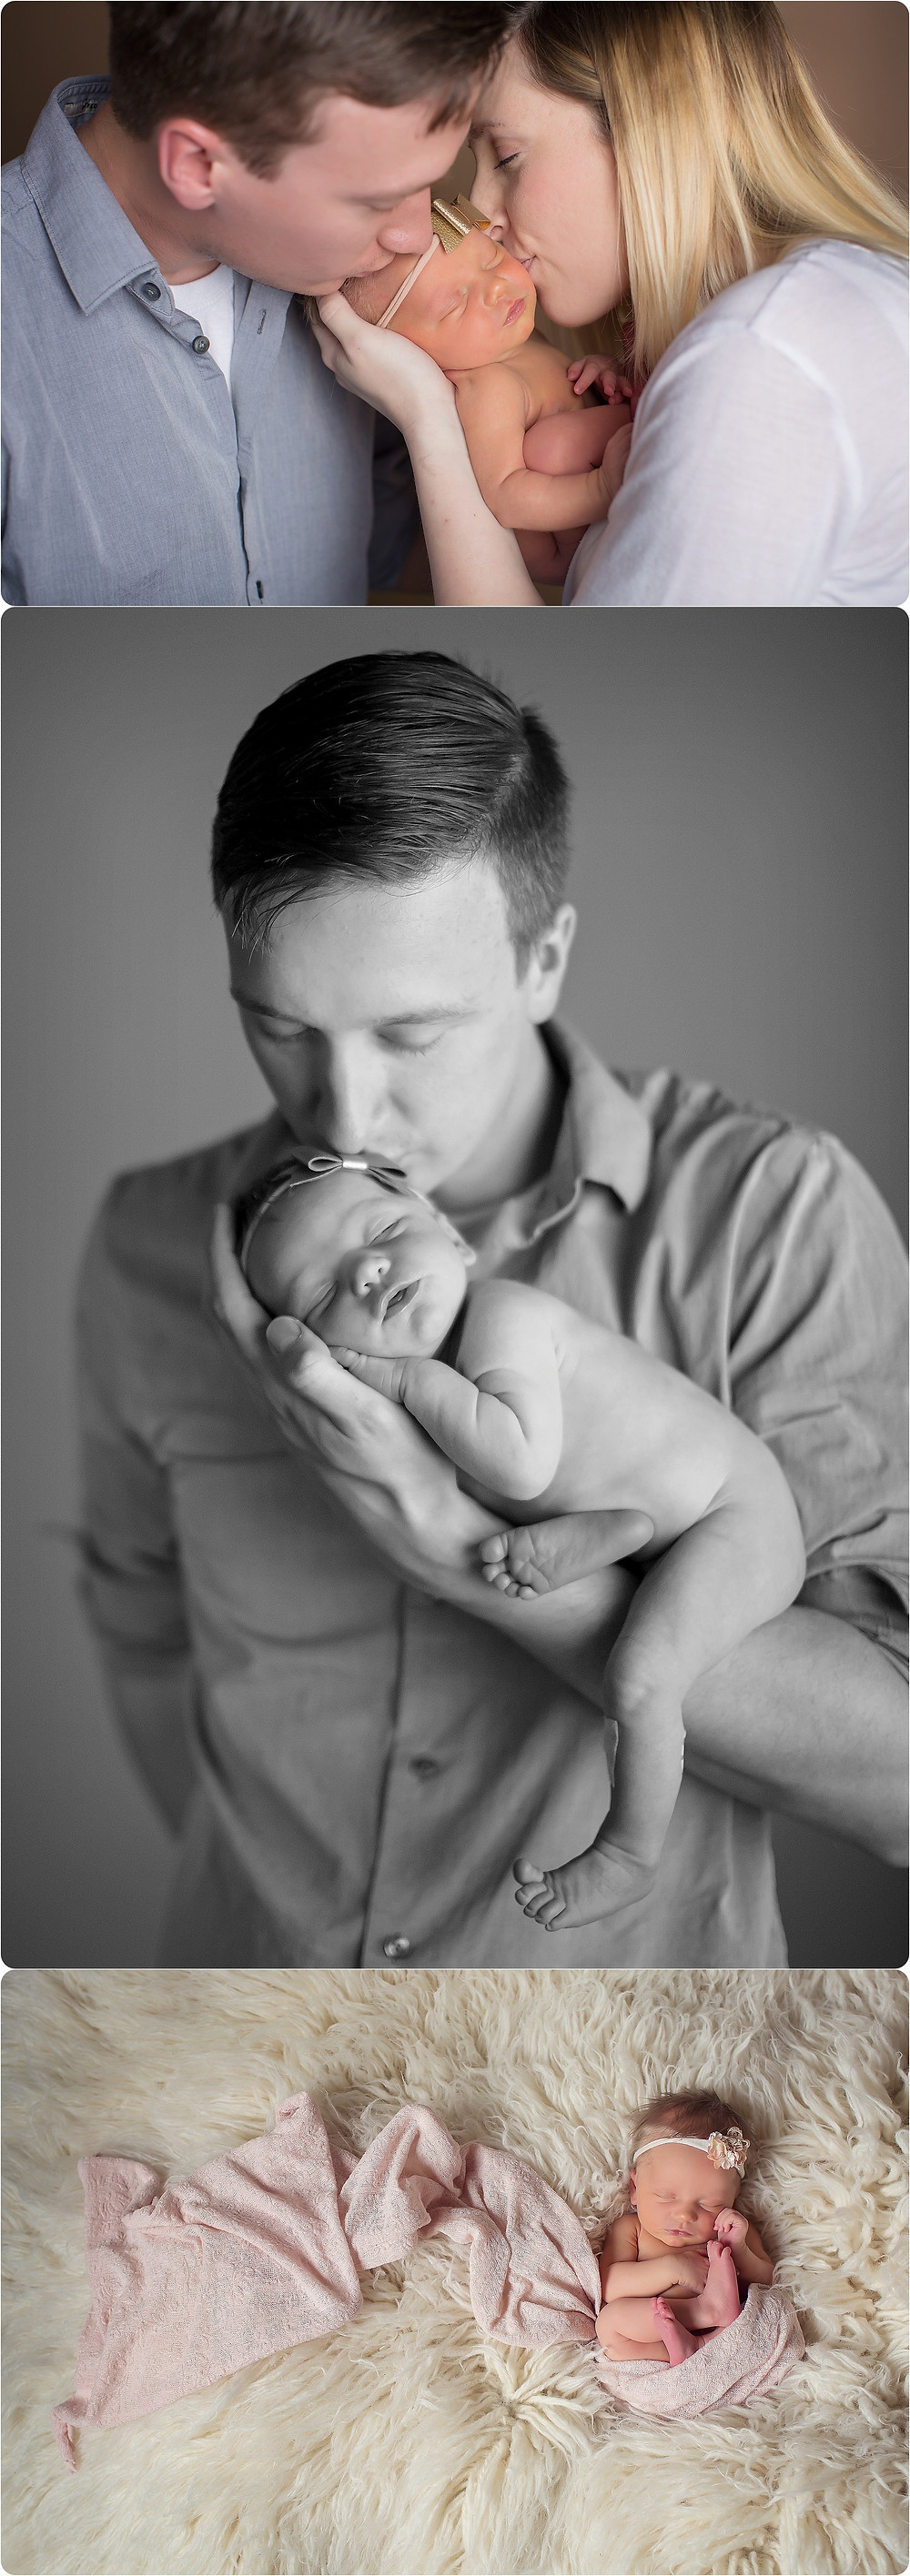 OKC Newborn Special